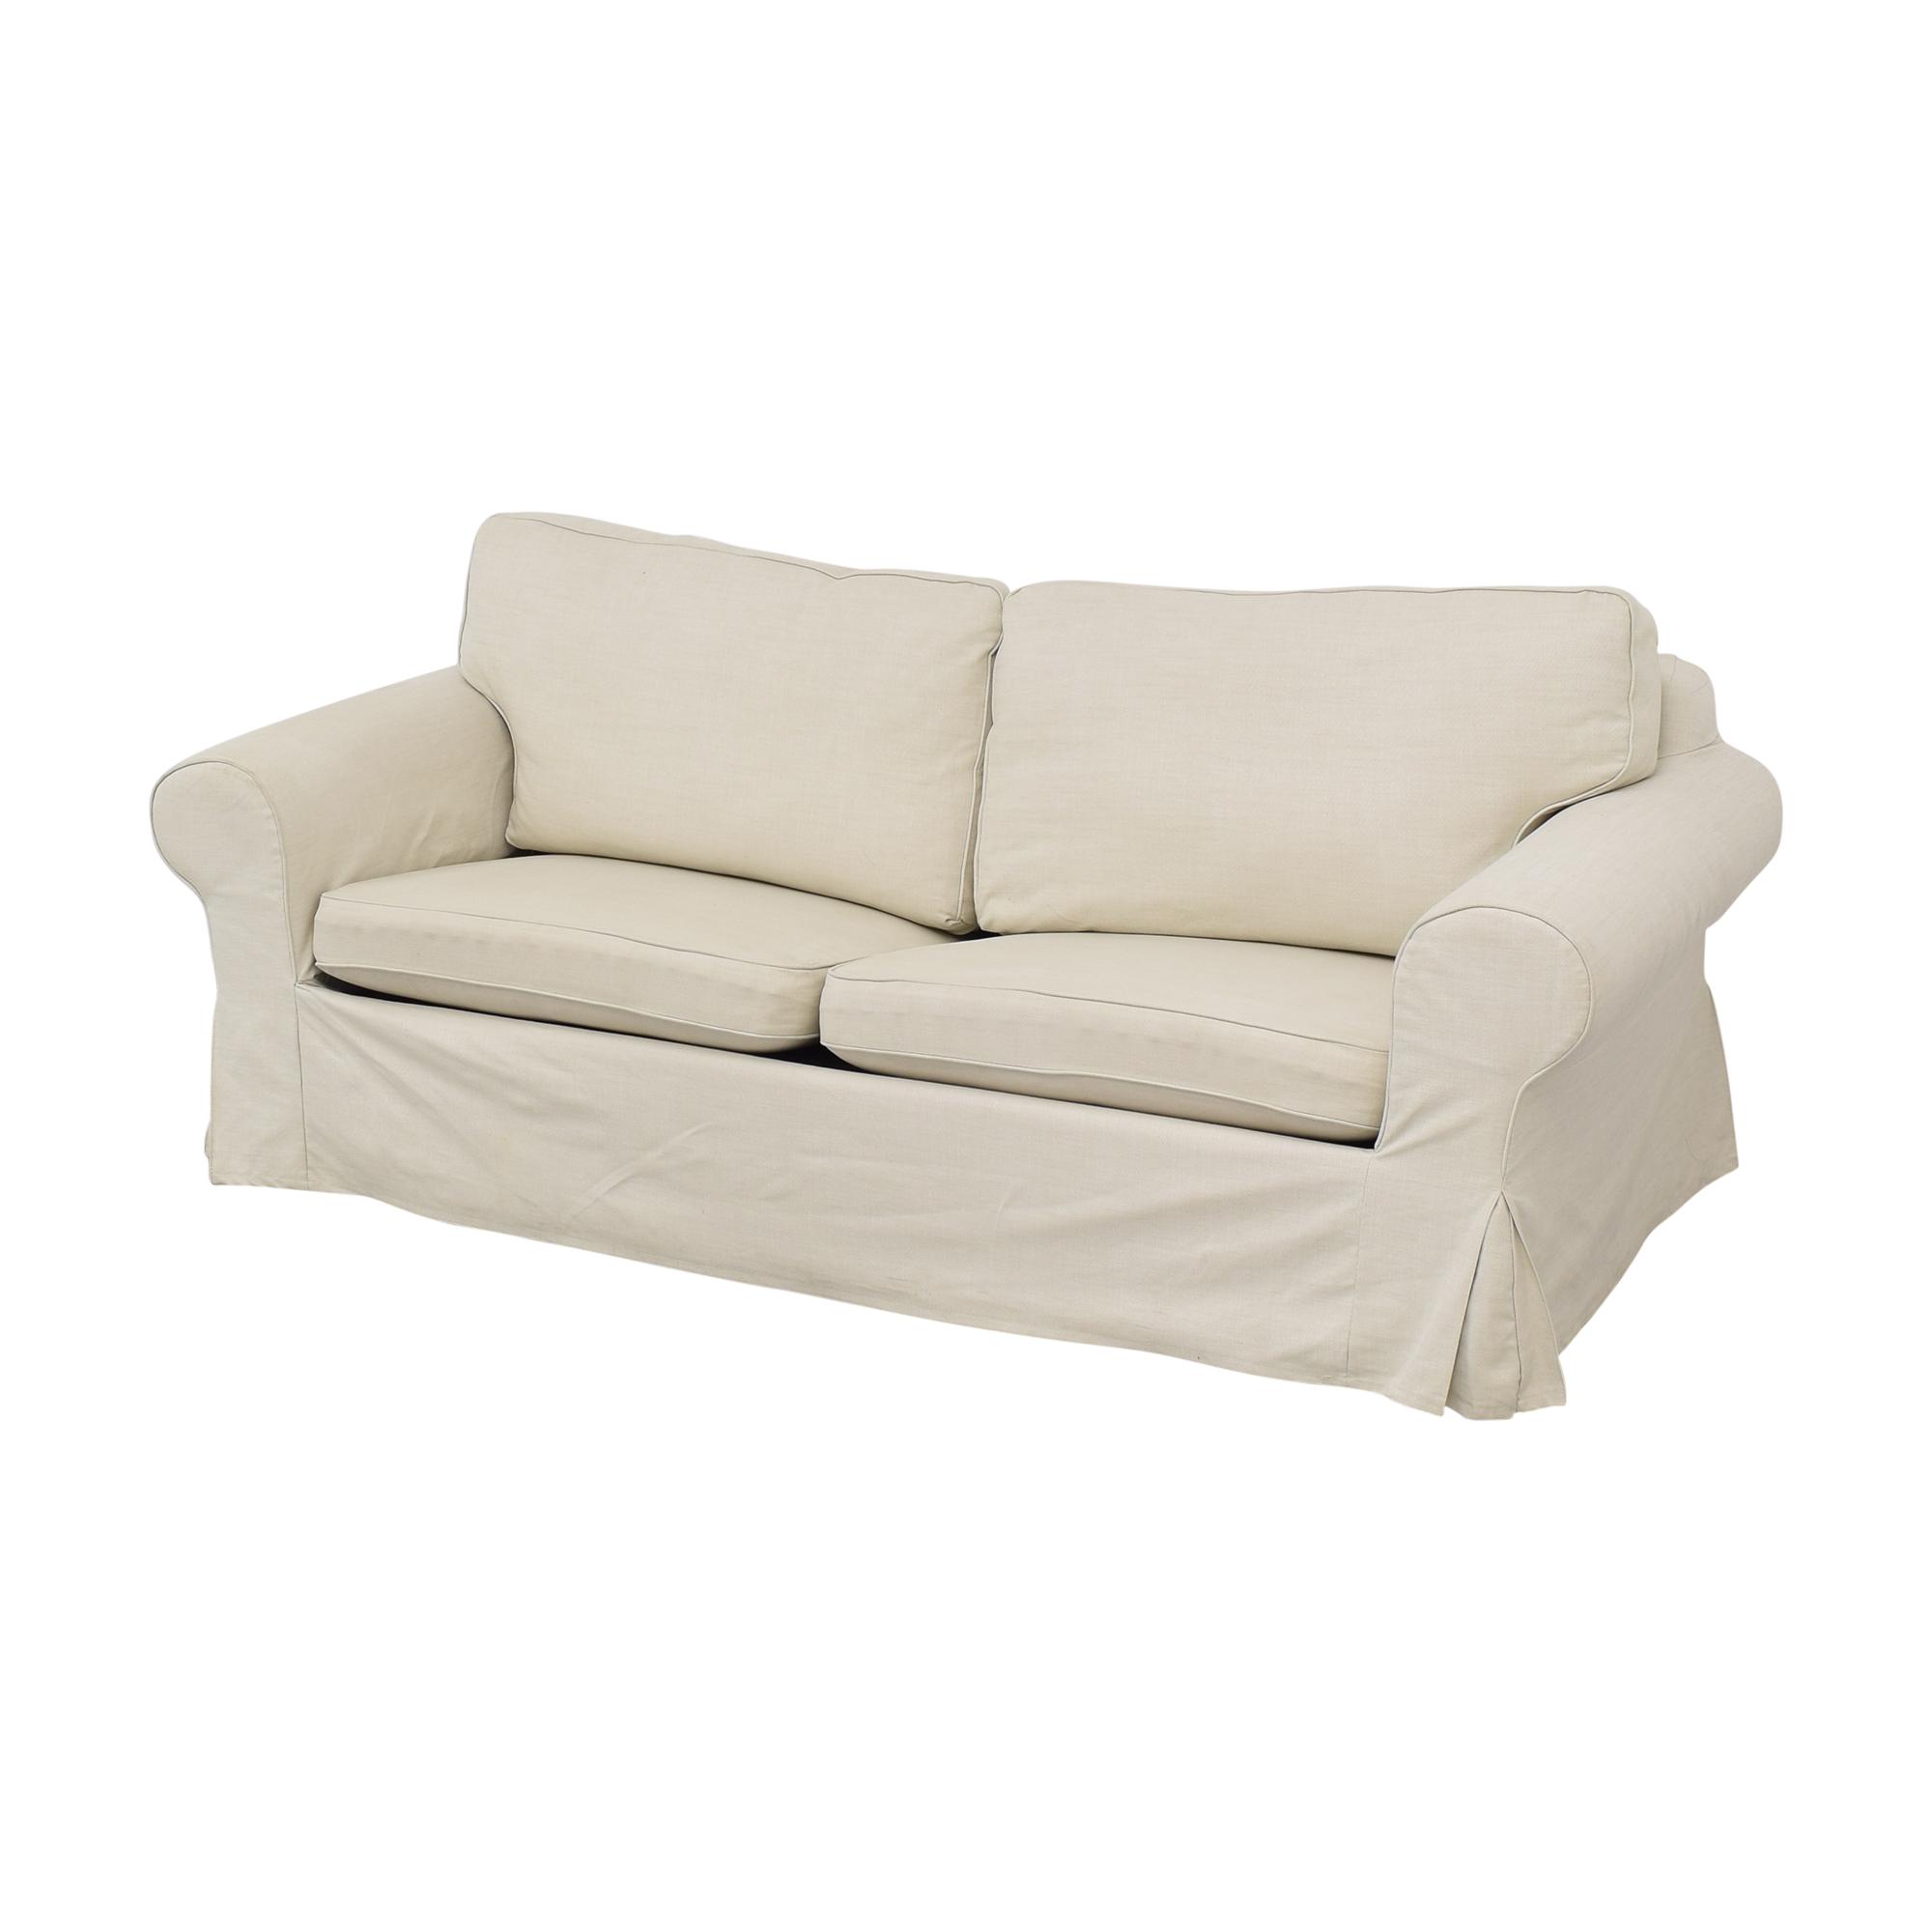 IKEA Ikea Ektorp Sofa Bed ct